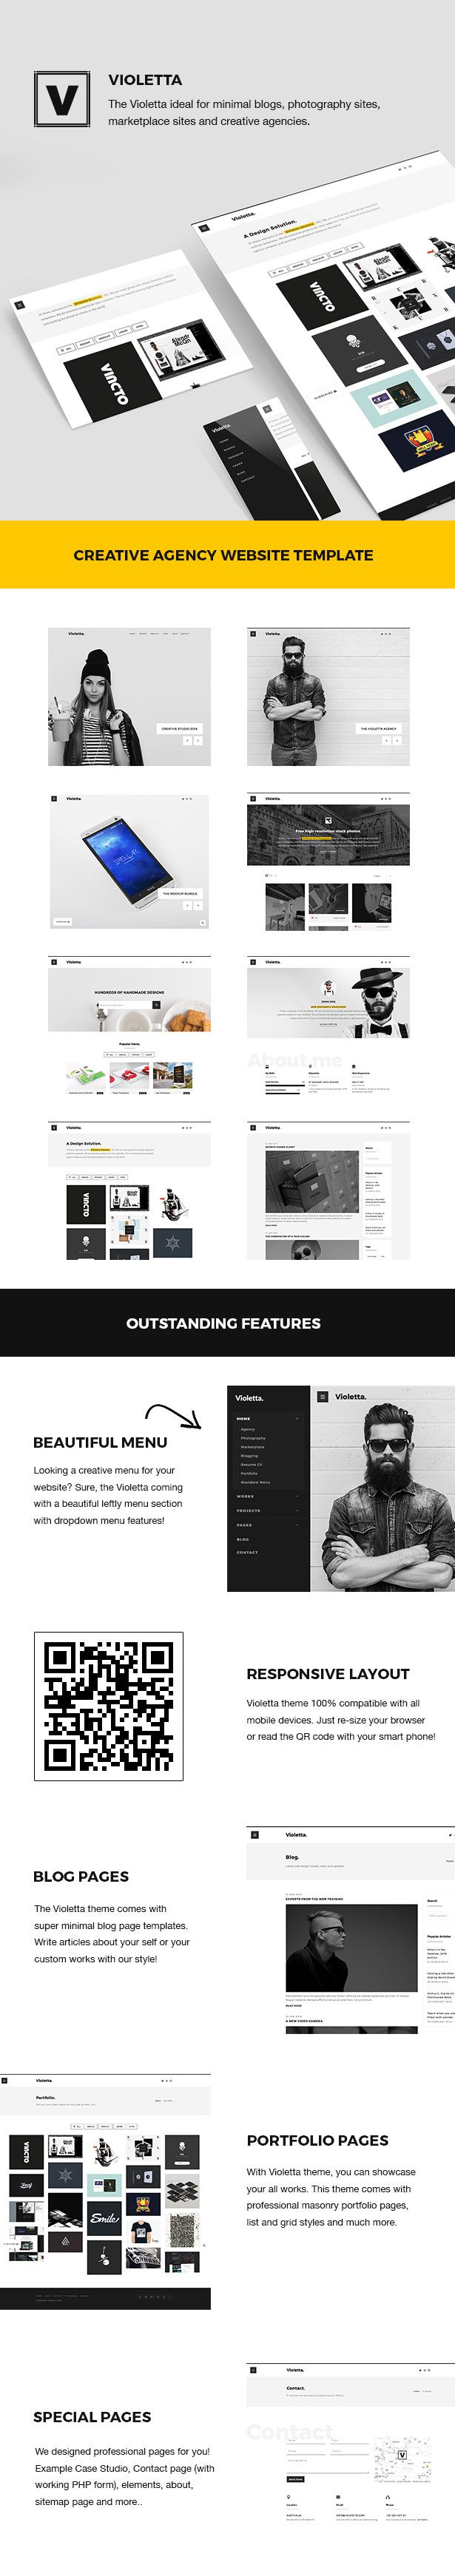 Violetta | Creative Agency Minimal Responsive WordPress Theme #wordpress #blog #cv • Download theme ➝ https://themeforest.net/item/violetta-creative-agency-minimal-responsive-wordpress-theme/18763454?ref=pxcr